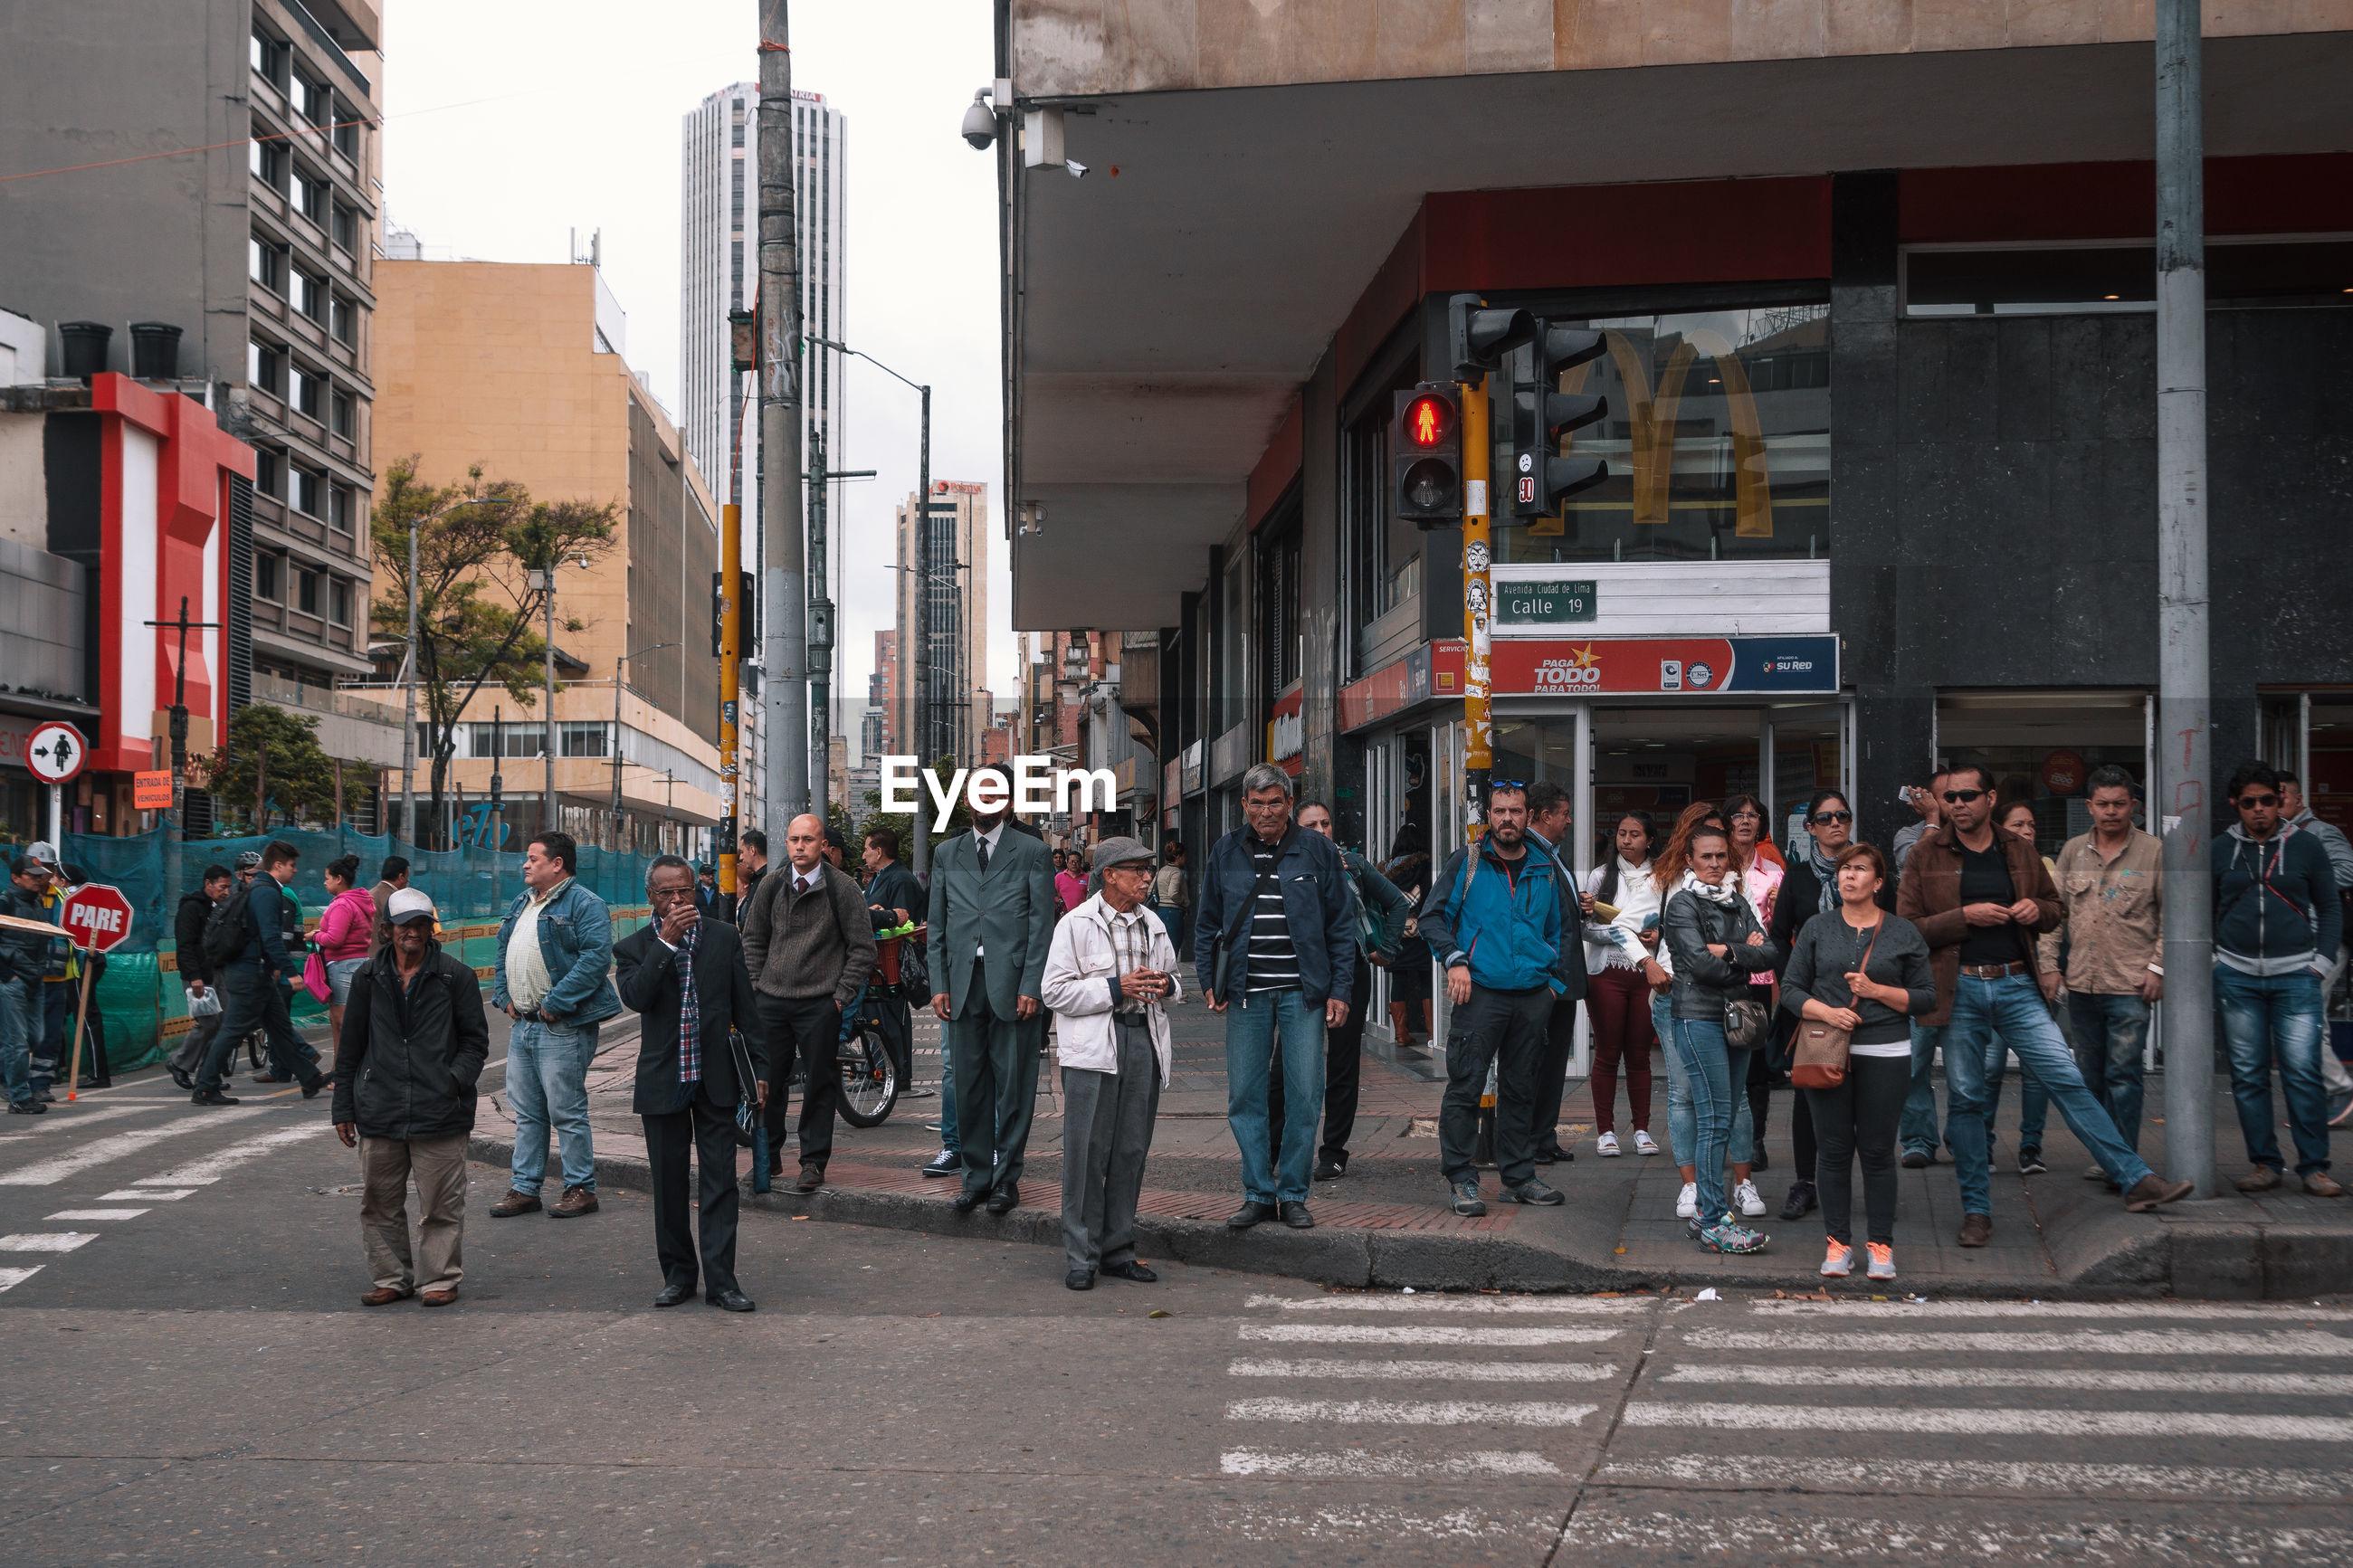 GROUP OF PEOPLE WALKING ON CITY STREET